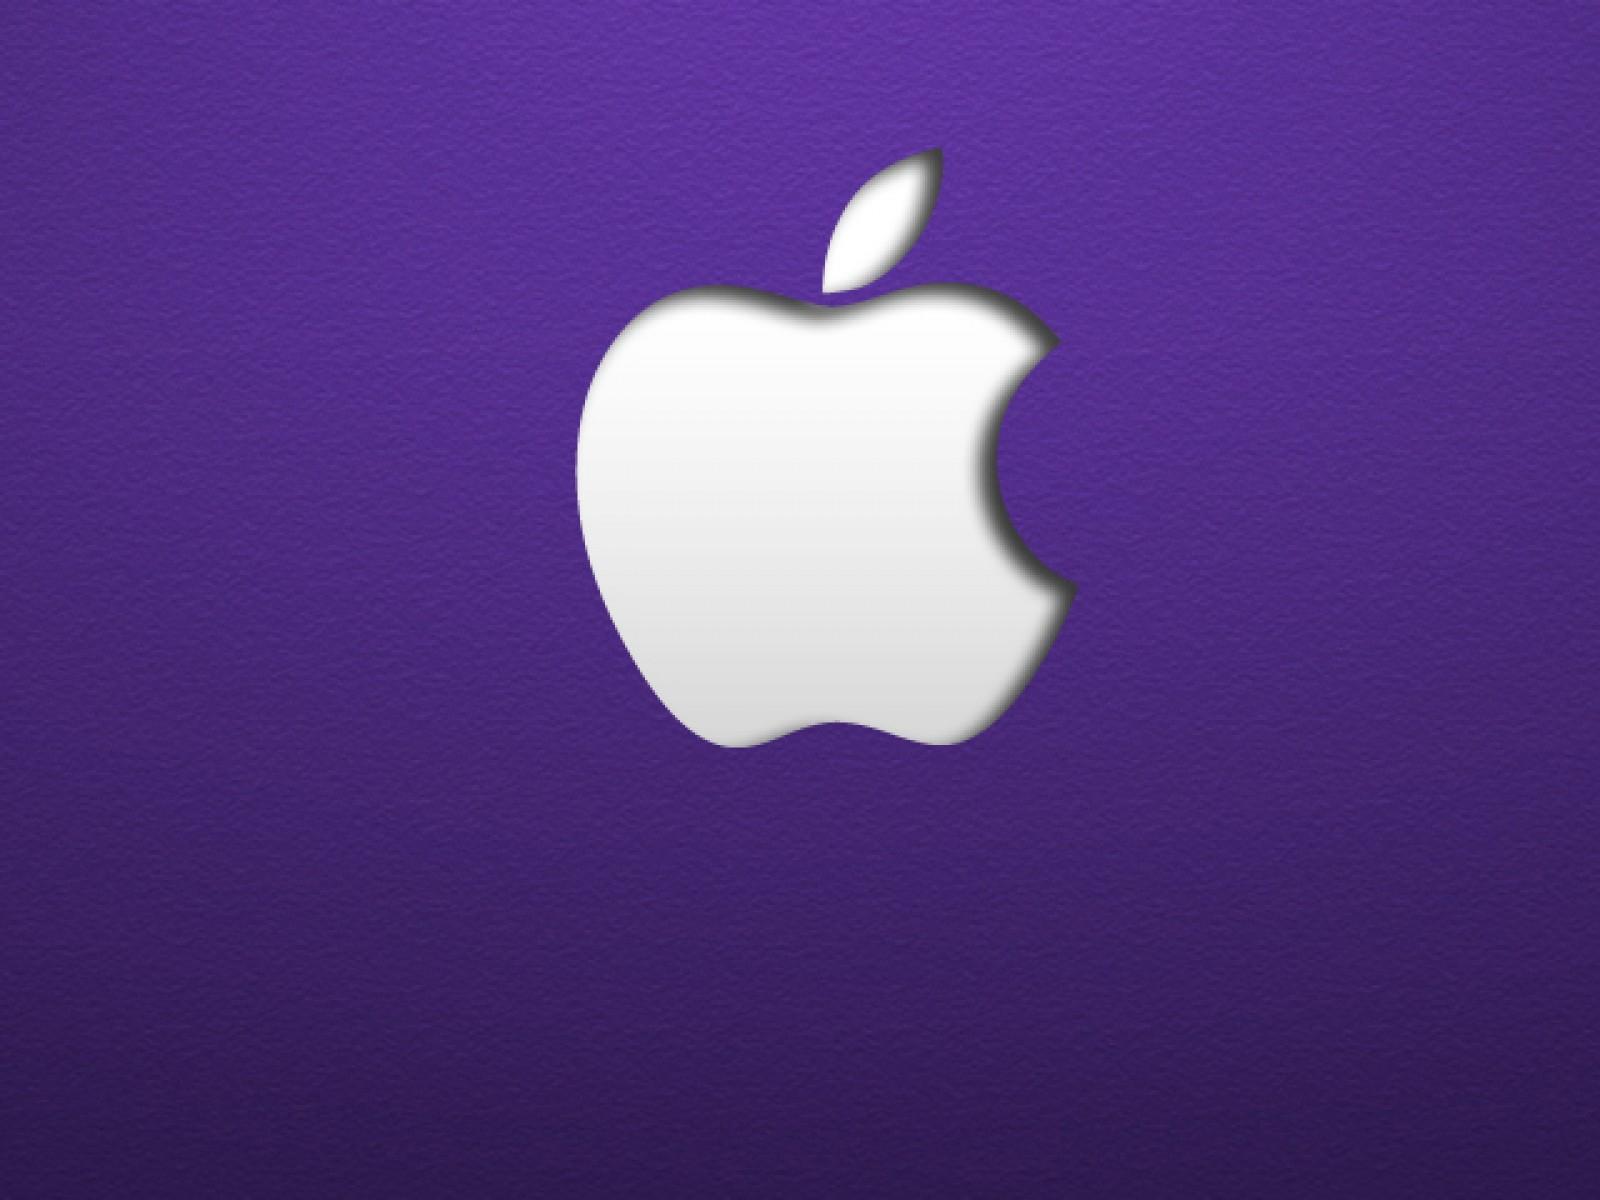 http://4.bp.blogspot.com/-qVcIIjMp_Sc/Twsth0dU-mI/AAAAAAAAByg/Ux2Vopk593s/s1600/apple_iphone_logo+7.jpg